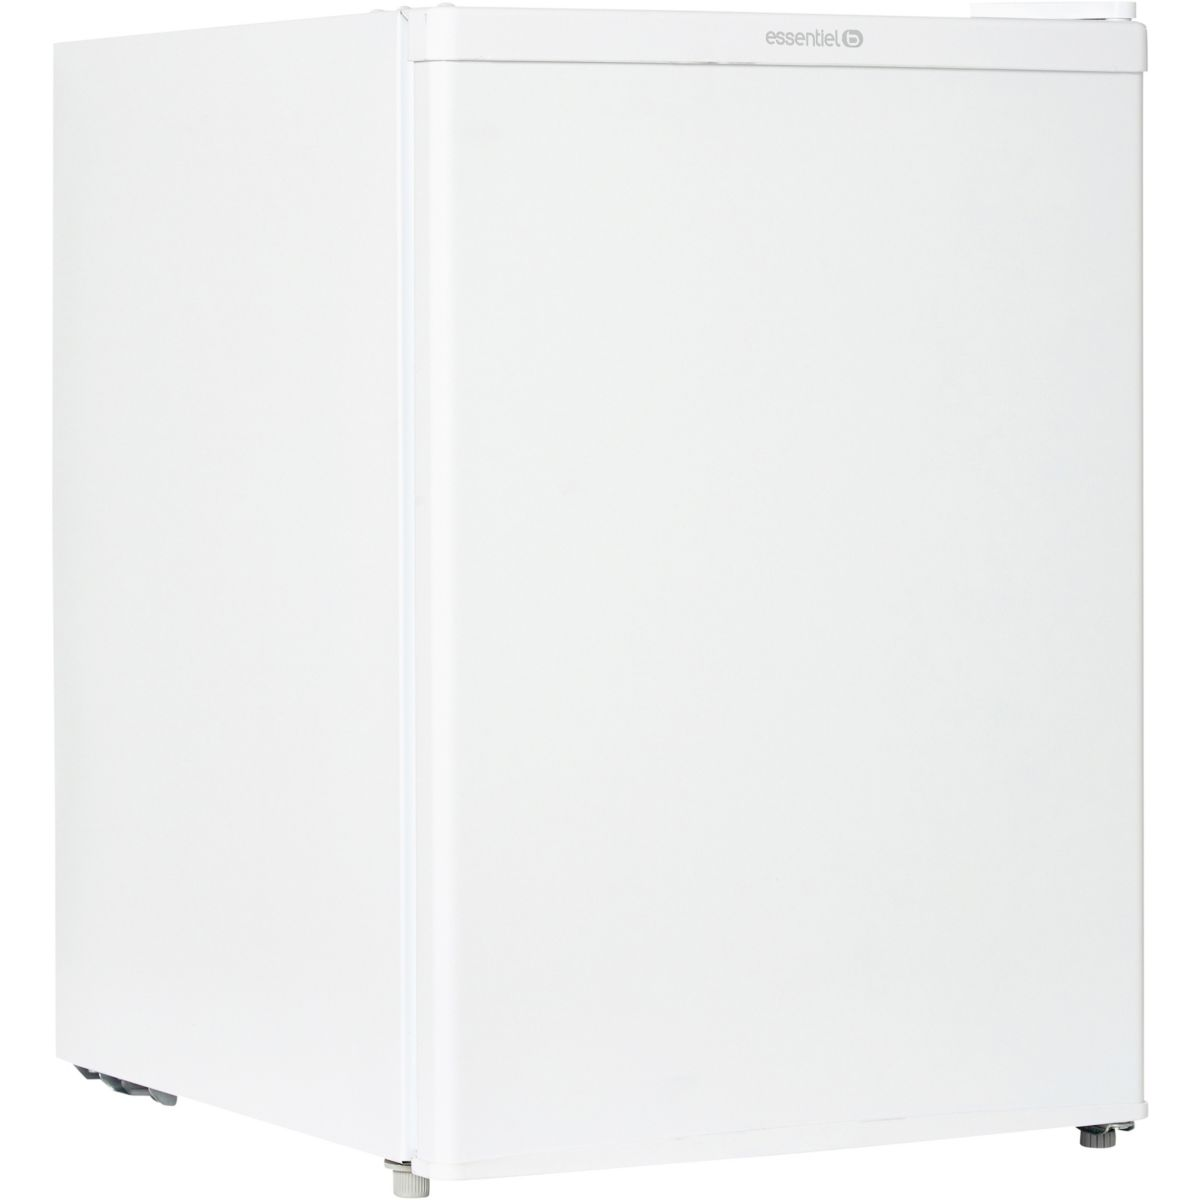 Mini réfrigérateur ESSENTIELB ERM 65-45b1